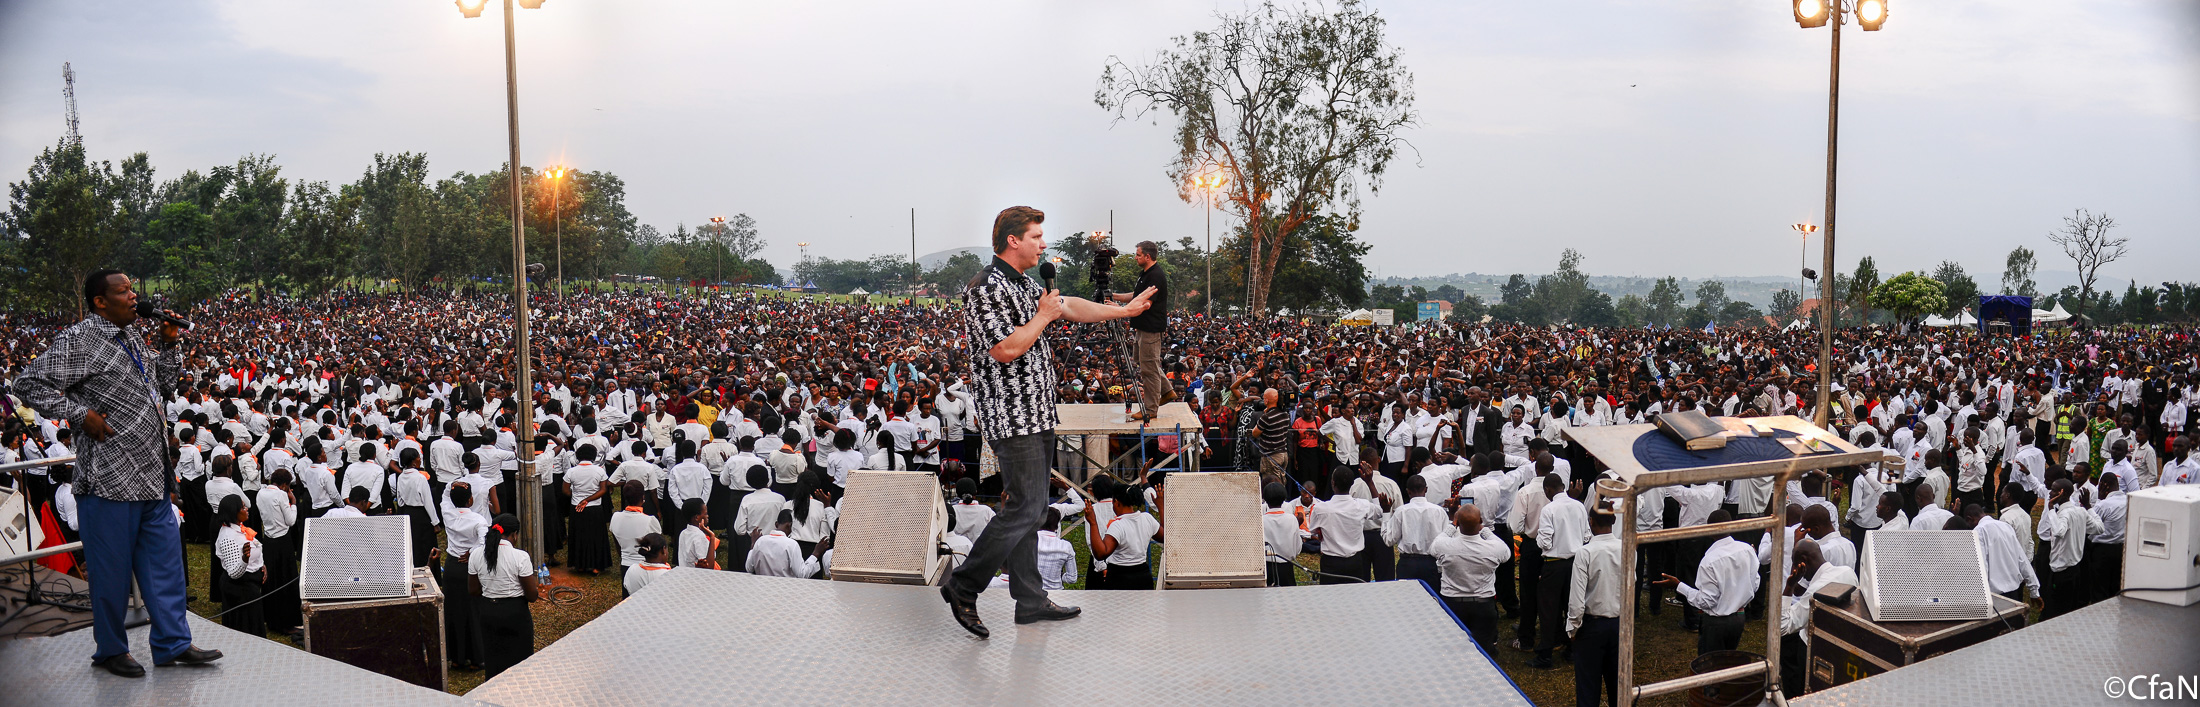 Uganda-Mbarara-2015-D1-3262 Panorama